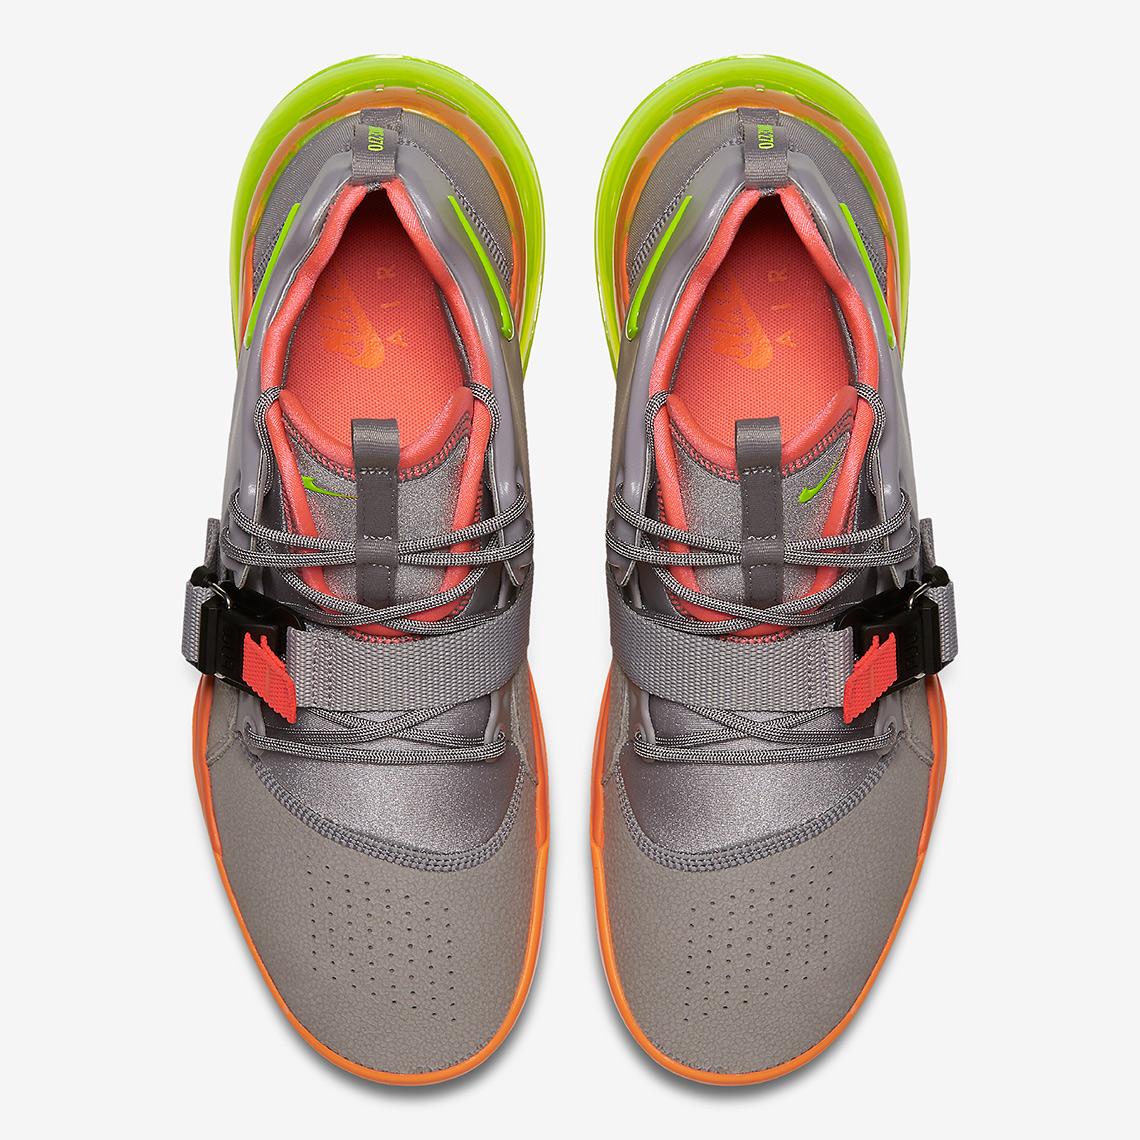 official photos 0cb11 1572b Nike Air Force 270 Sherbert AH6772-007 | SneakerNews.com